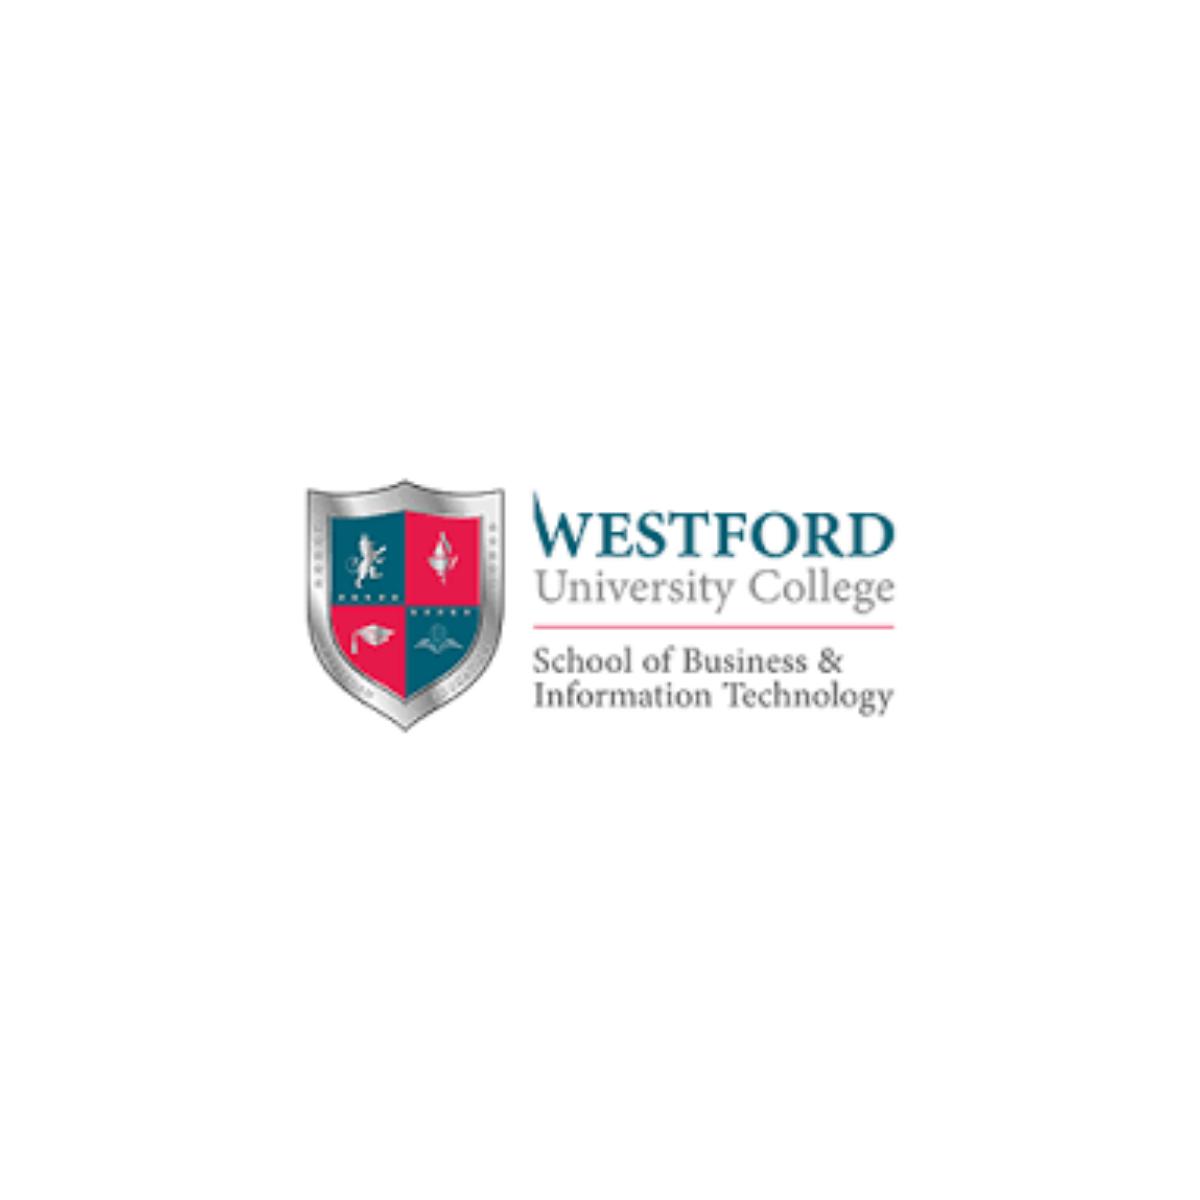 Westford University College Logo Image